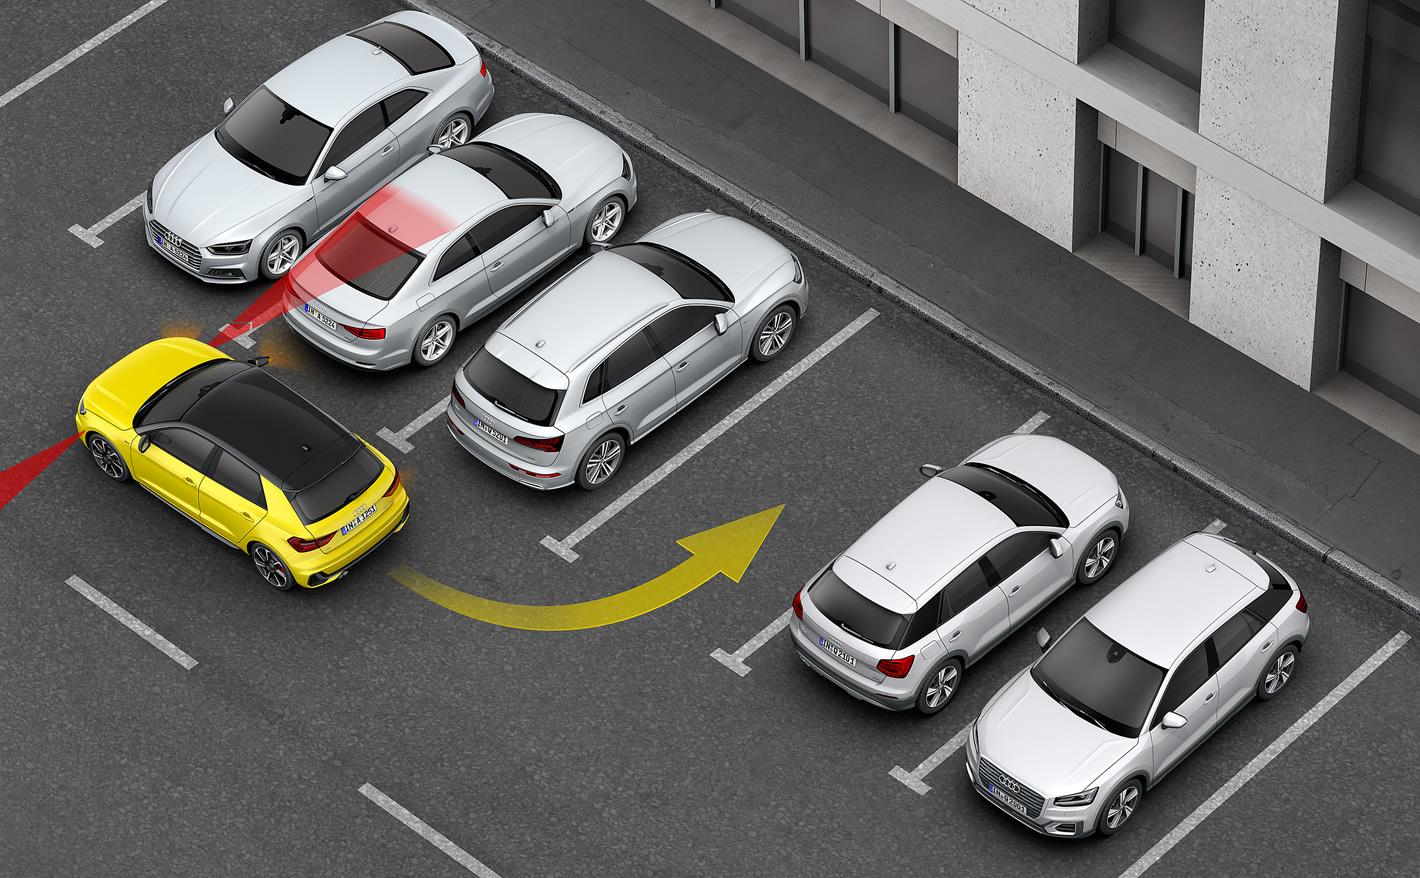 Audi A1 2019 - asystent parkowania